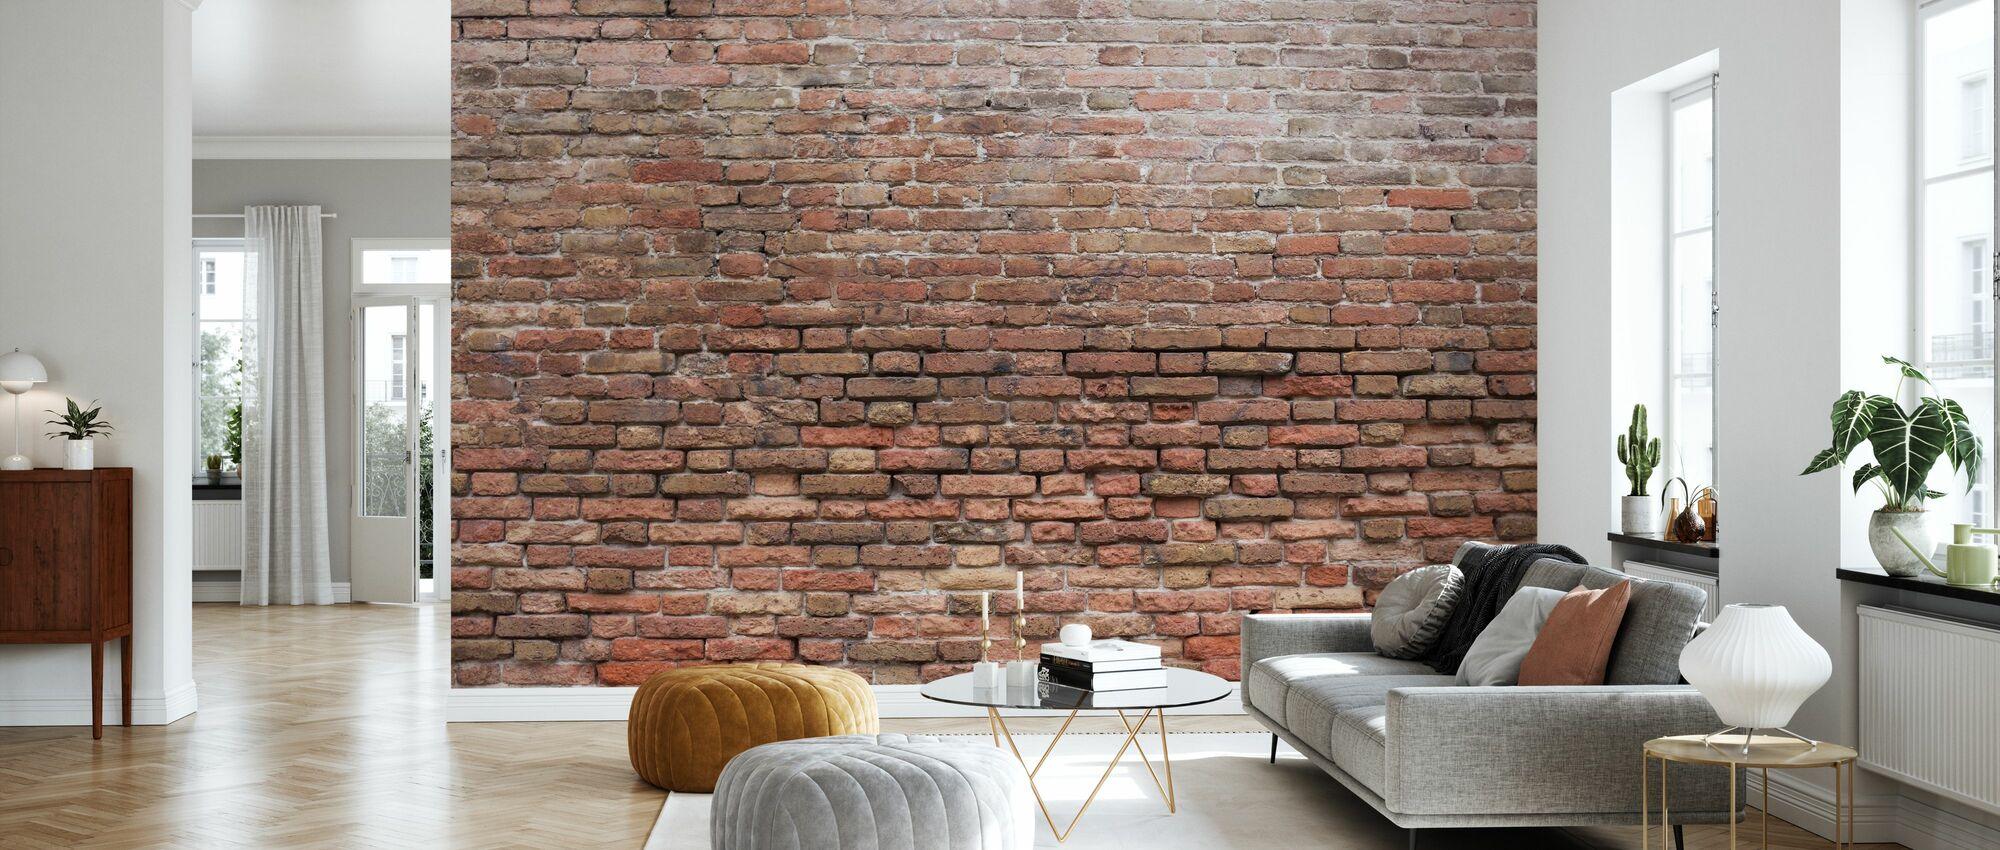 Dilapidated Brick Wall - Wallpaper - Living Room